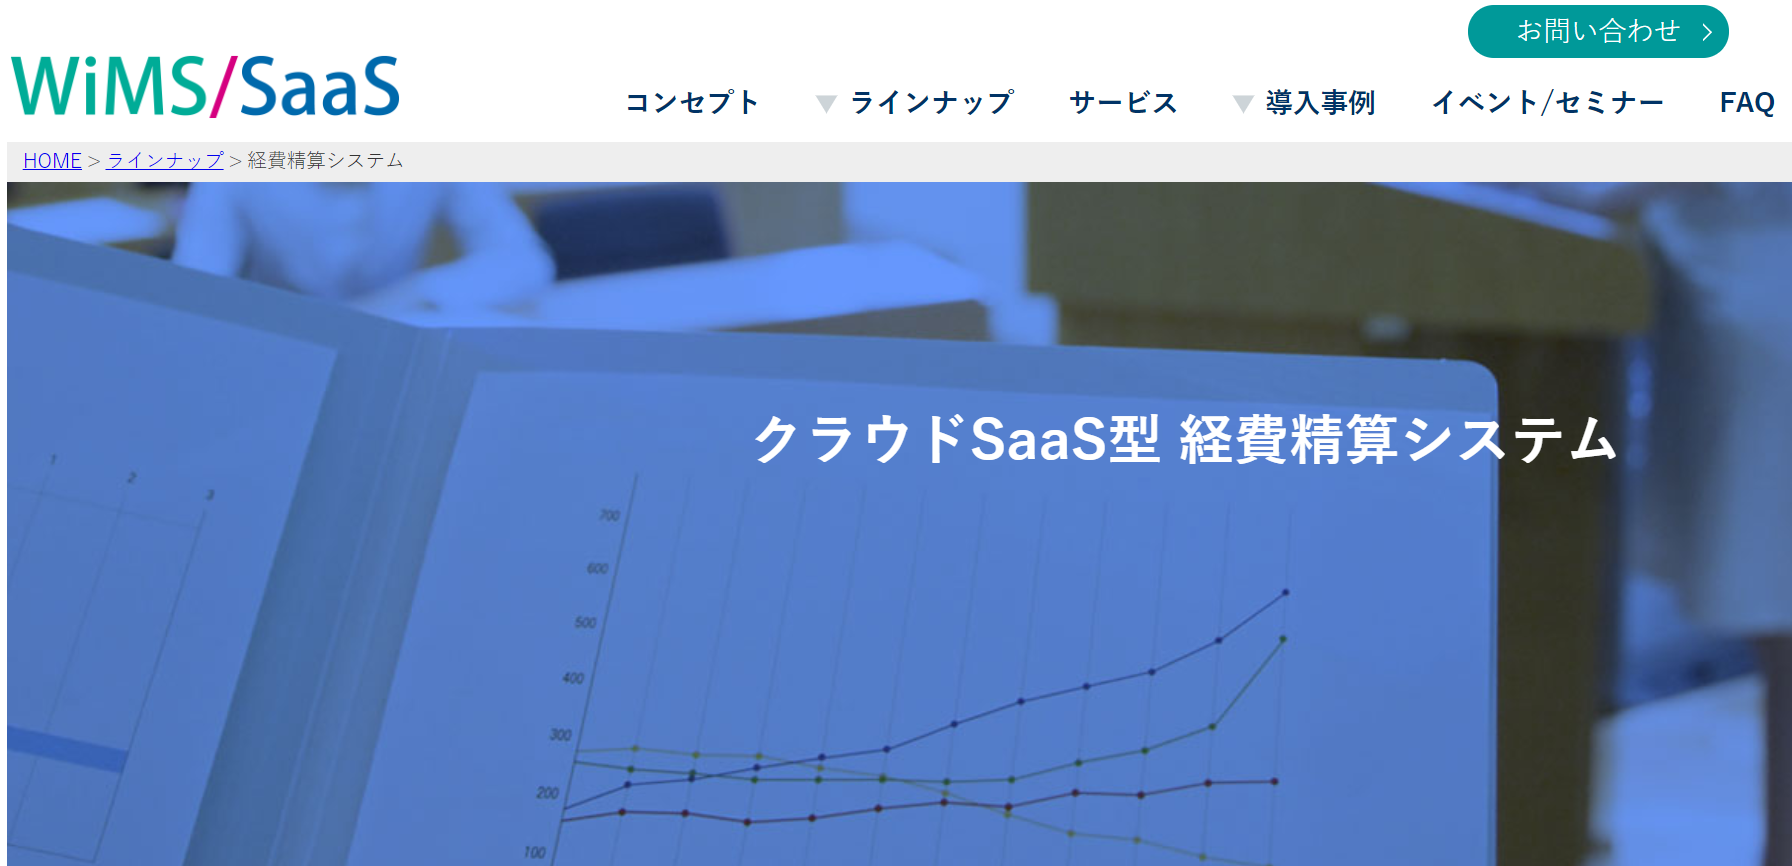 WiMS/SaaS経費精算システム